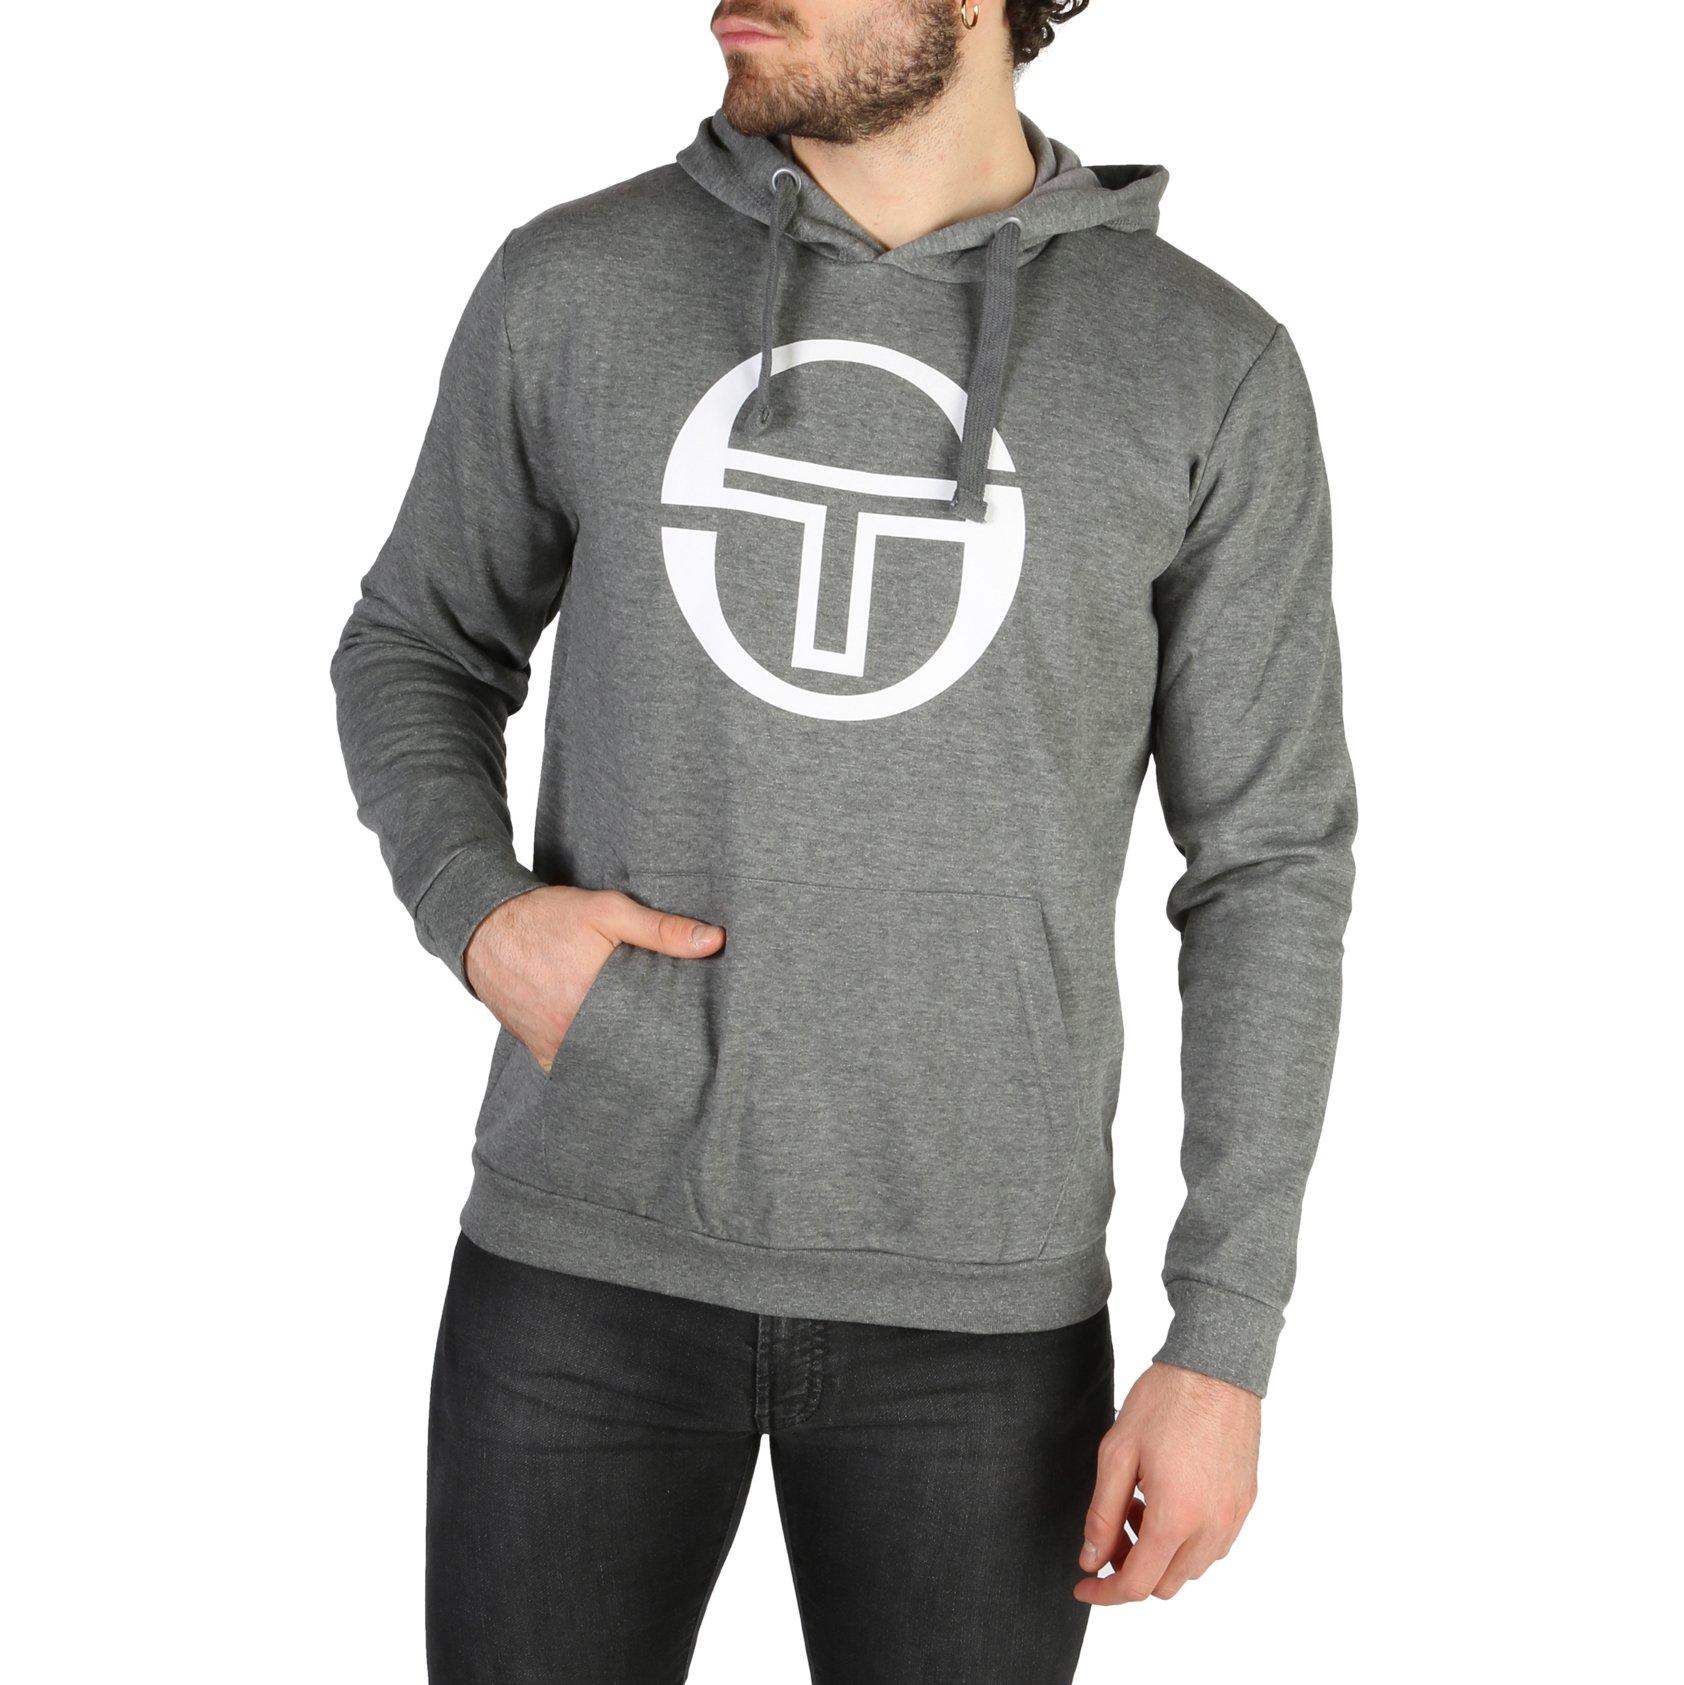 Sergio Tacchini Men's Sweatshirt Various Colours 103-10003 - grey S